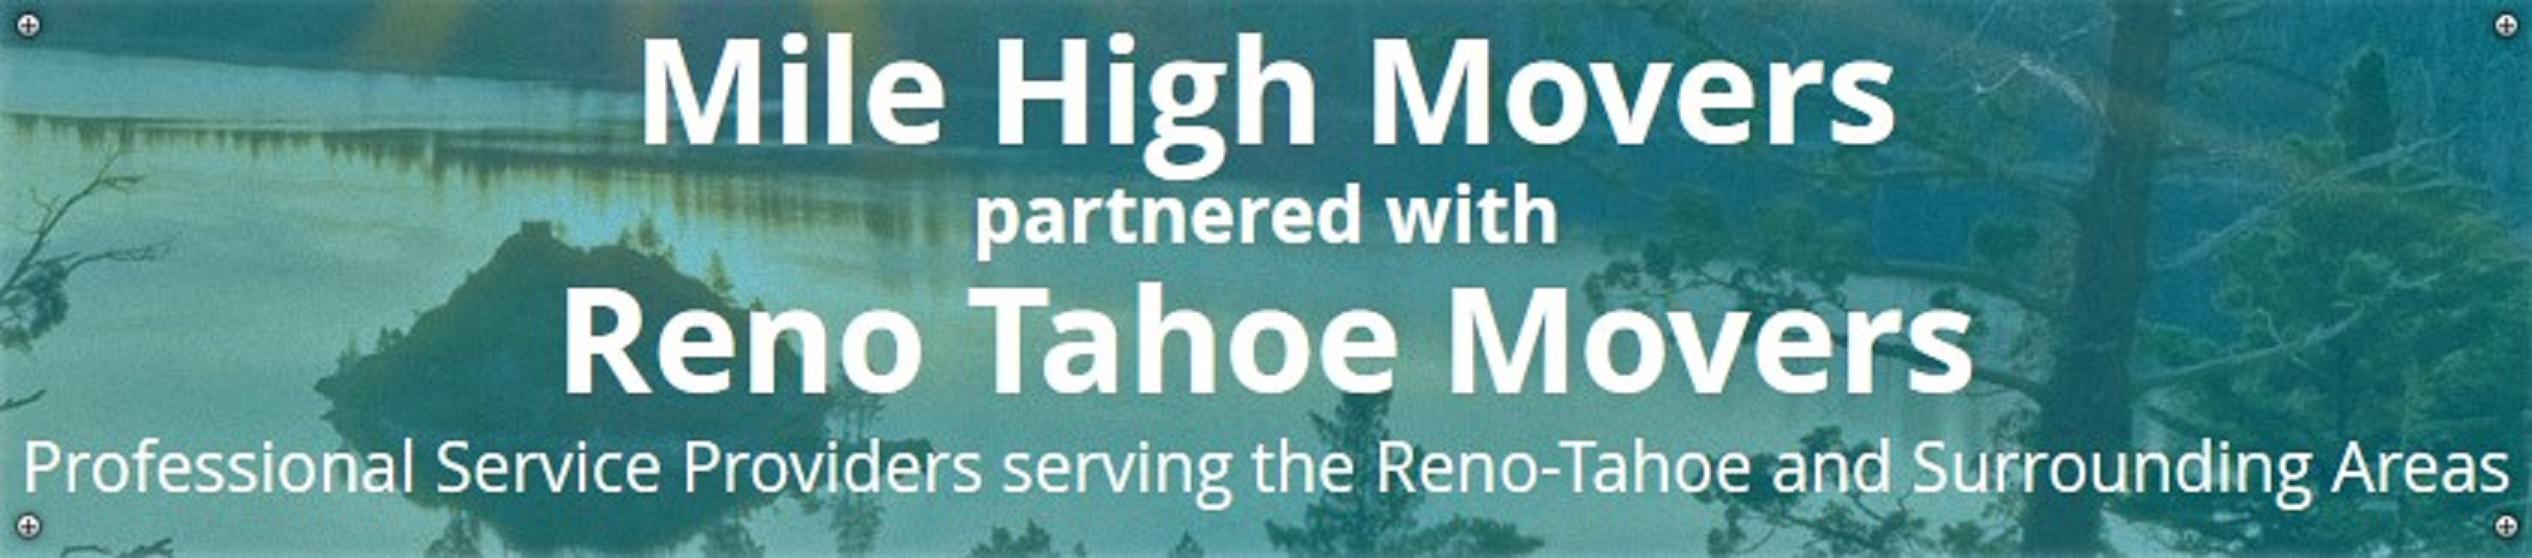 Reno Tahoe Movers Logo